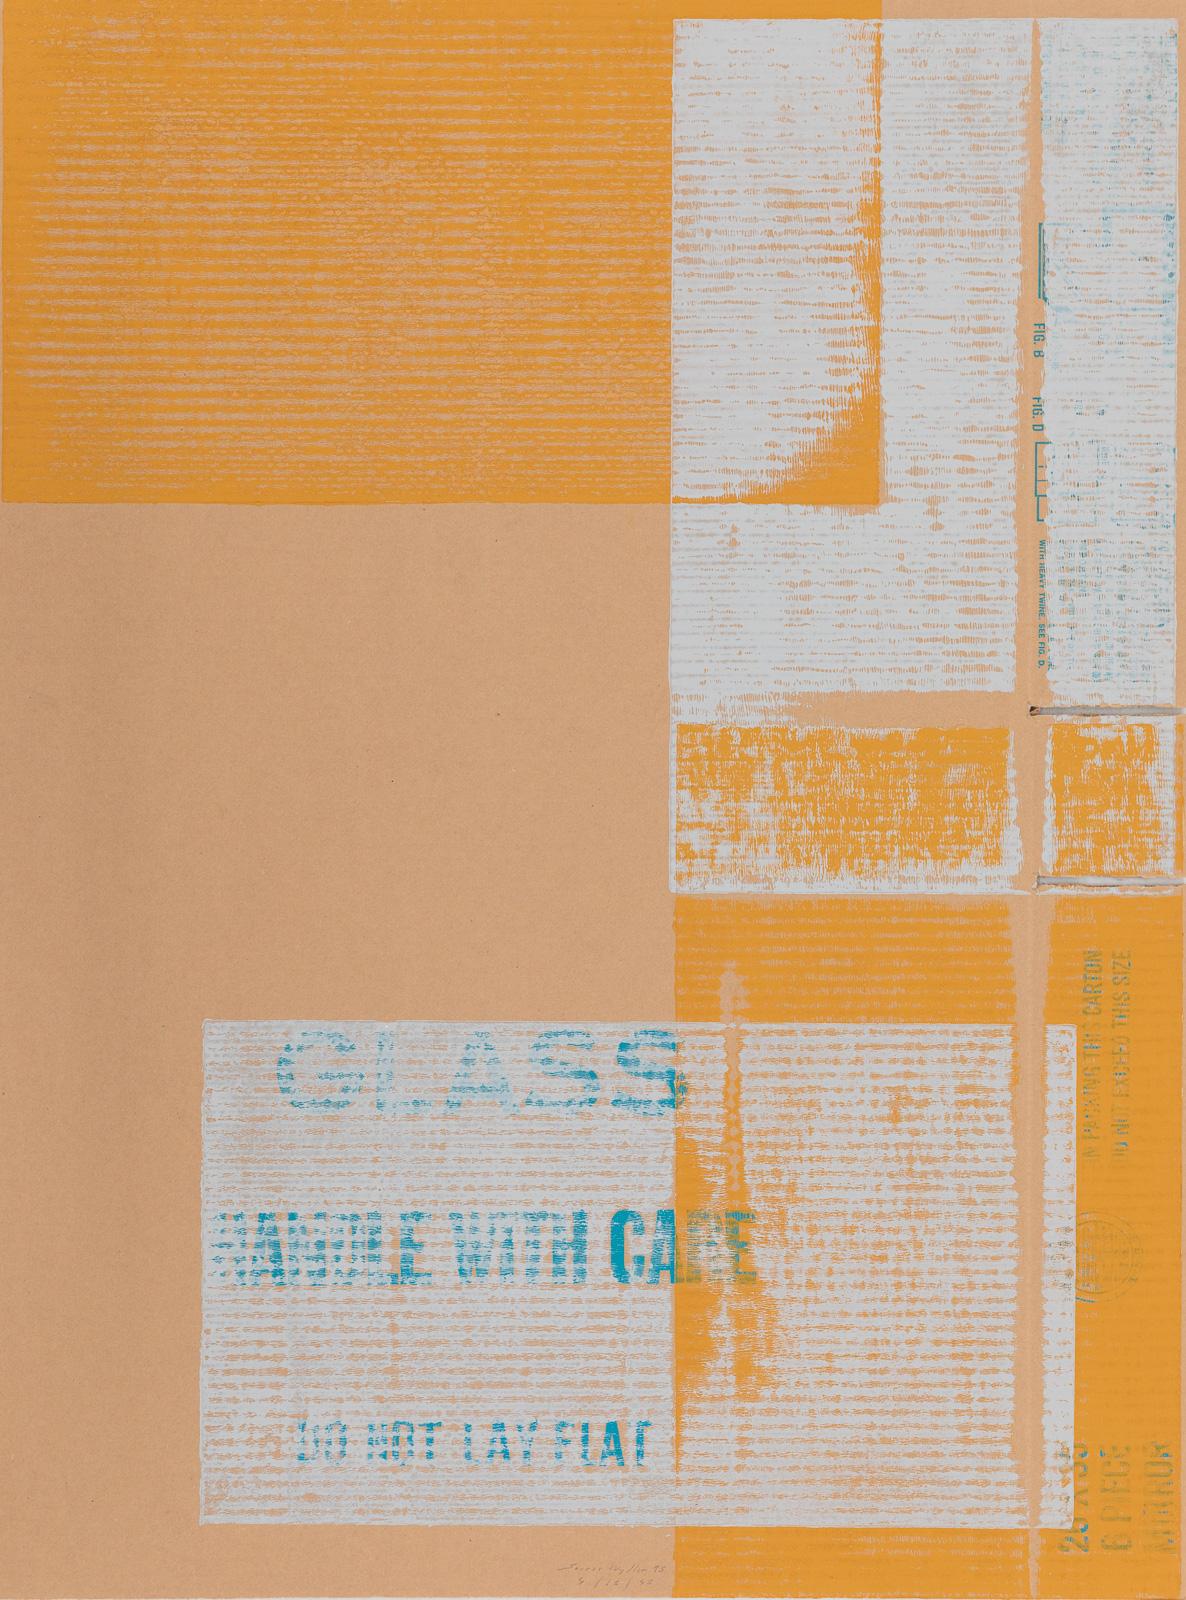 Sverre Wyller, Six Piece Flat Box, 1995, Portfolio with six woodcut prints, rubber stamp and screen print on cardboard, 88 x 65,5 cm